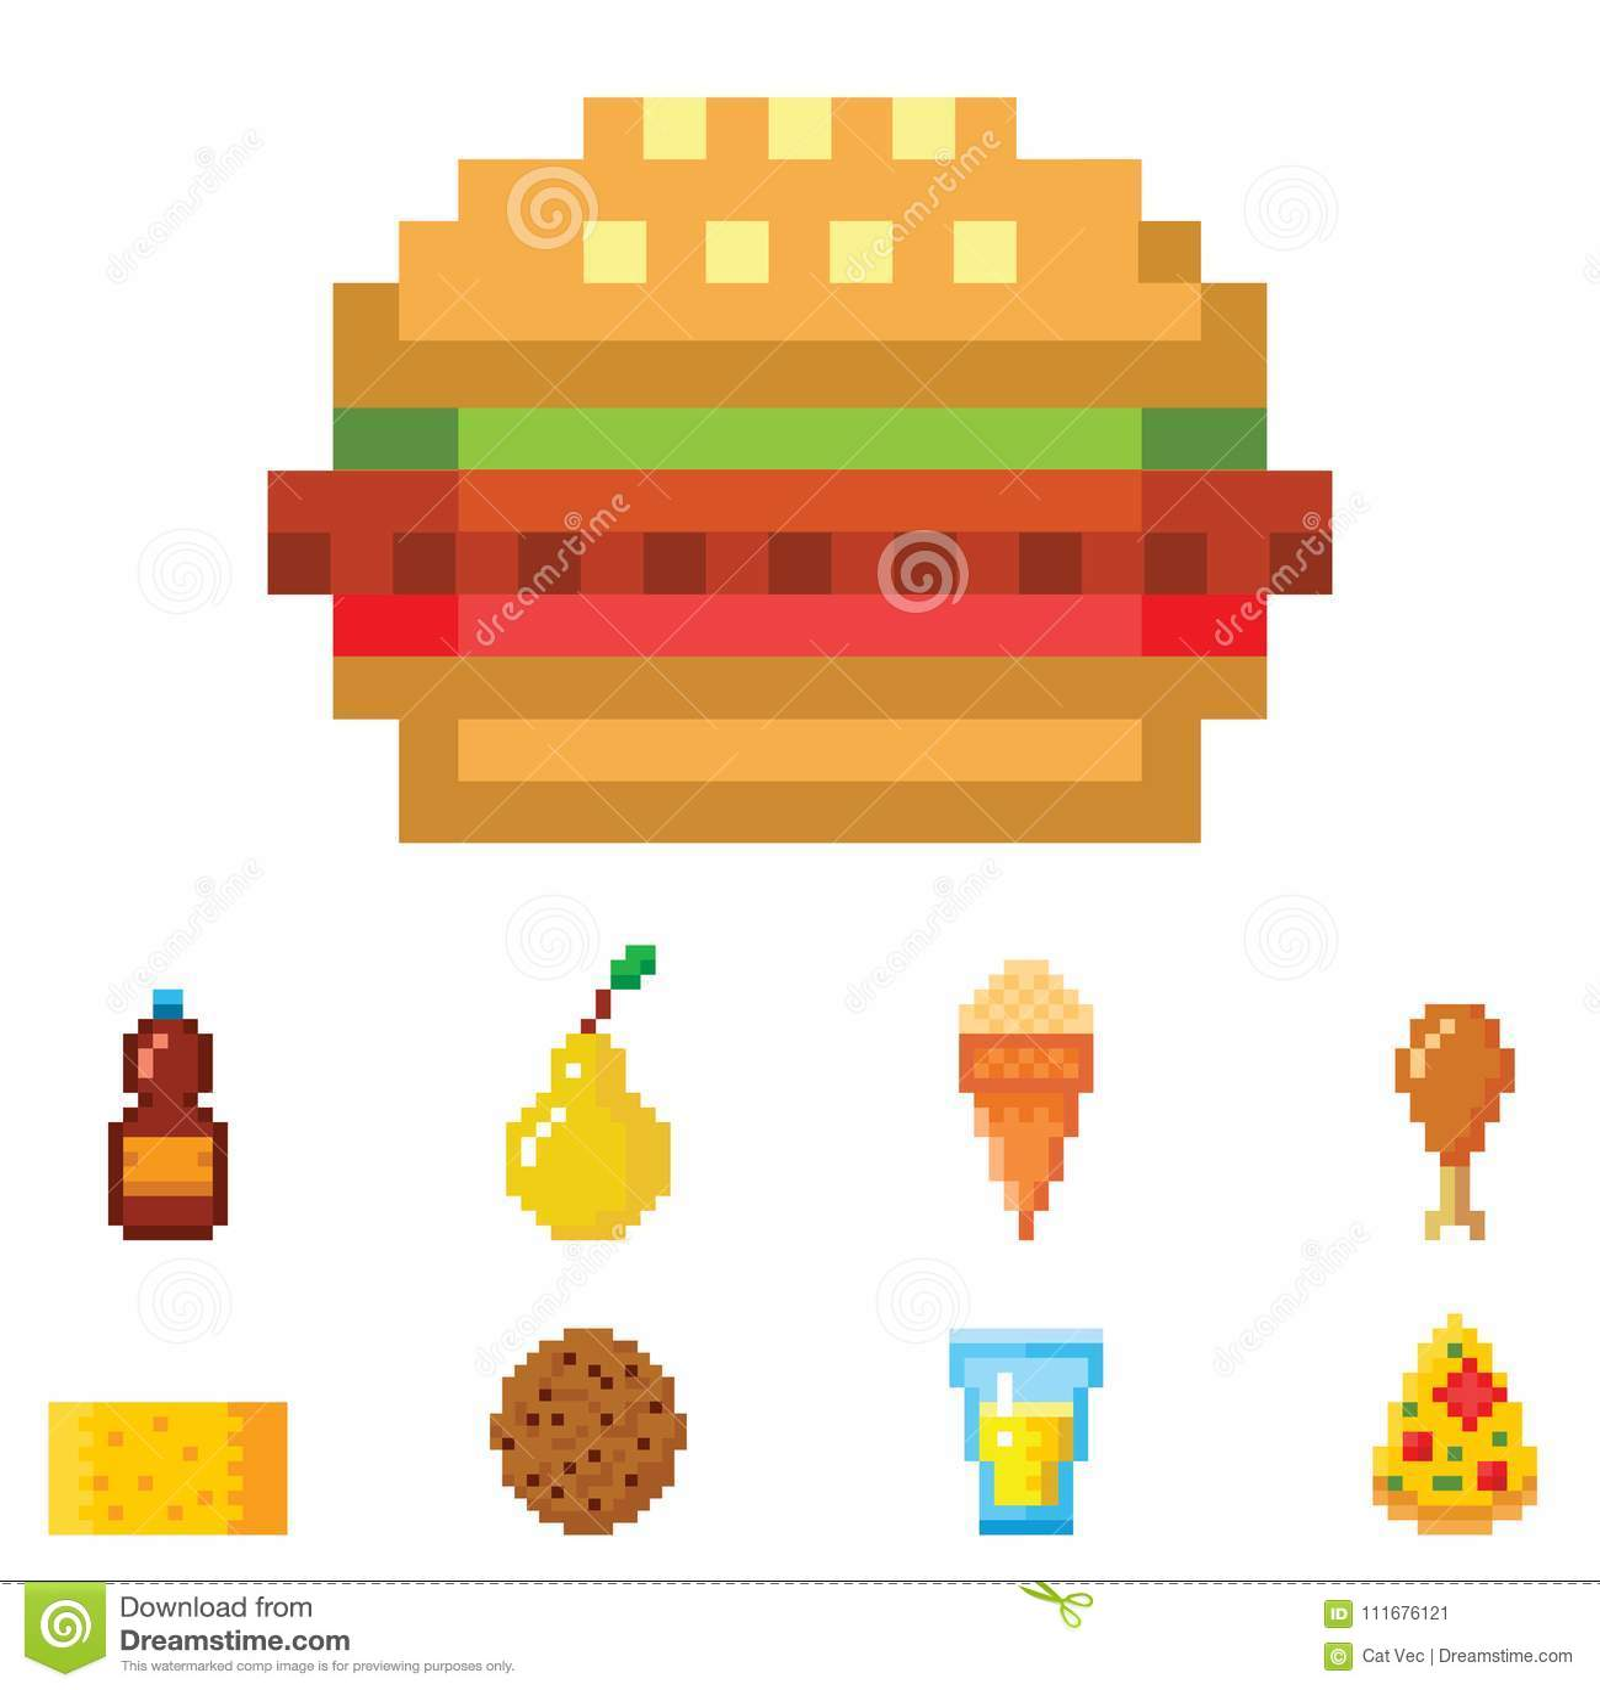 Pixel Art Food Computer Design Icons Vector Illustration Restaurant Pixelated Element Fast Food Retro Game Web Graphic Stock Vector Illustration Of Bottle Cartoon 111676121